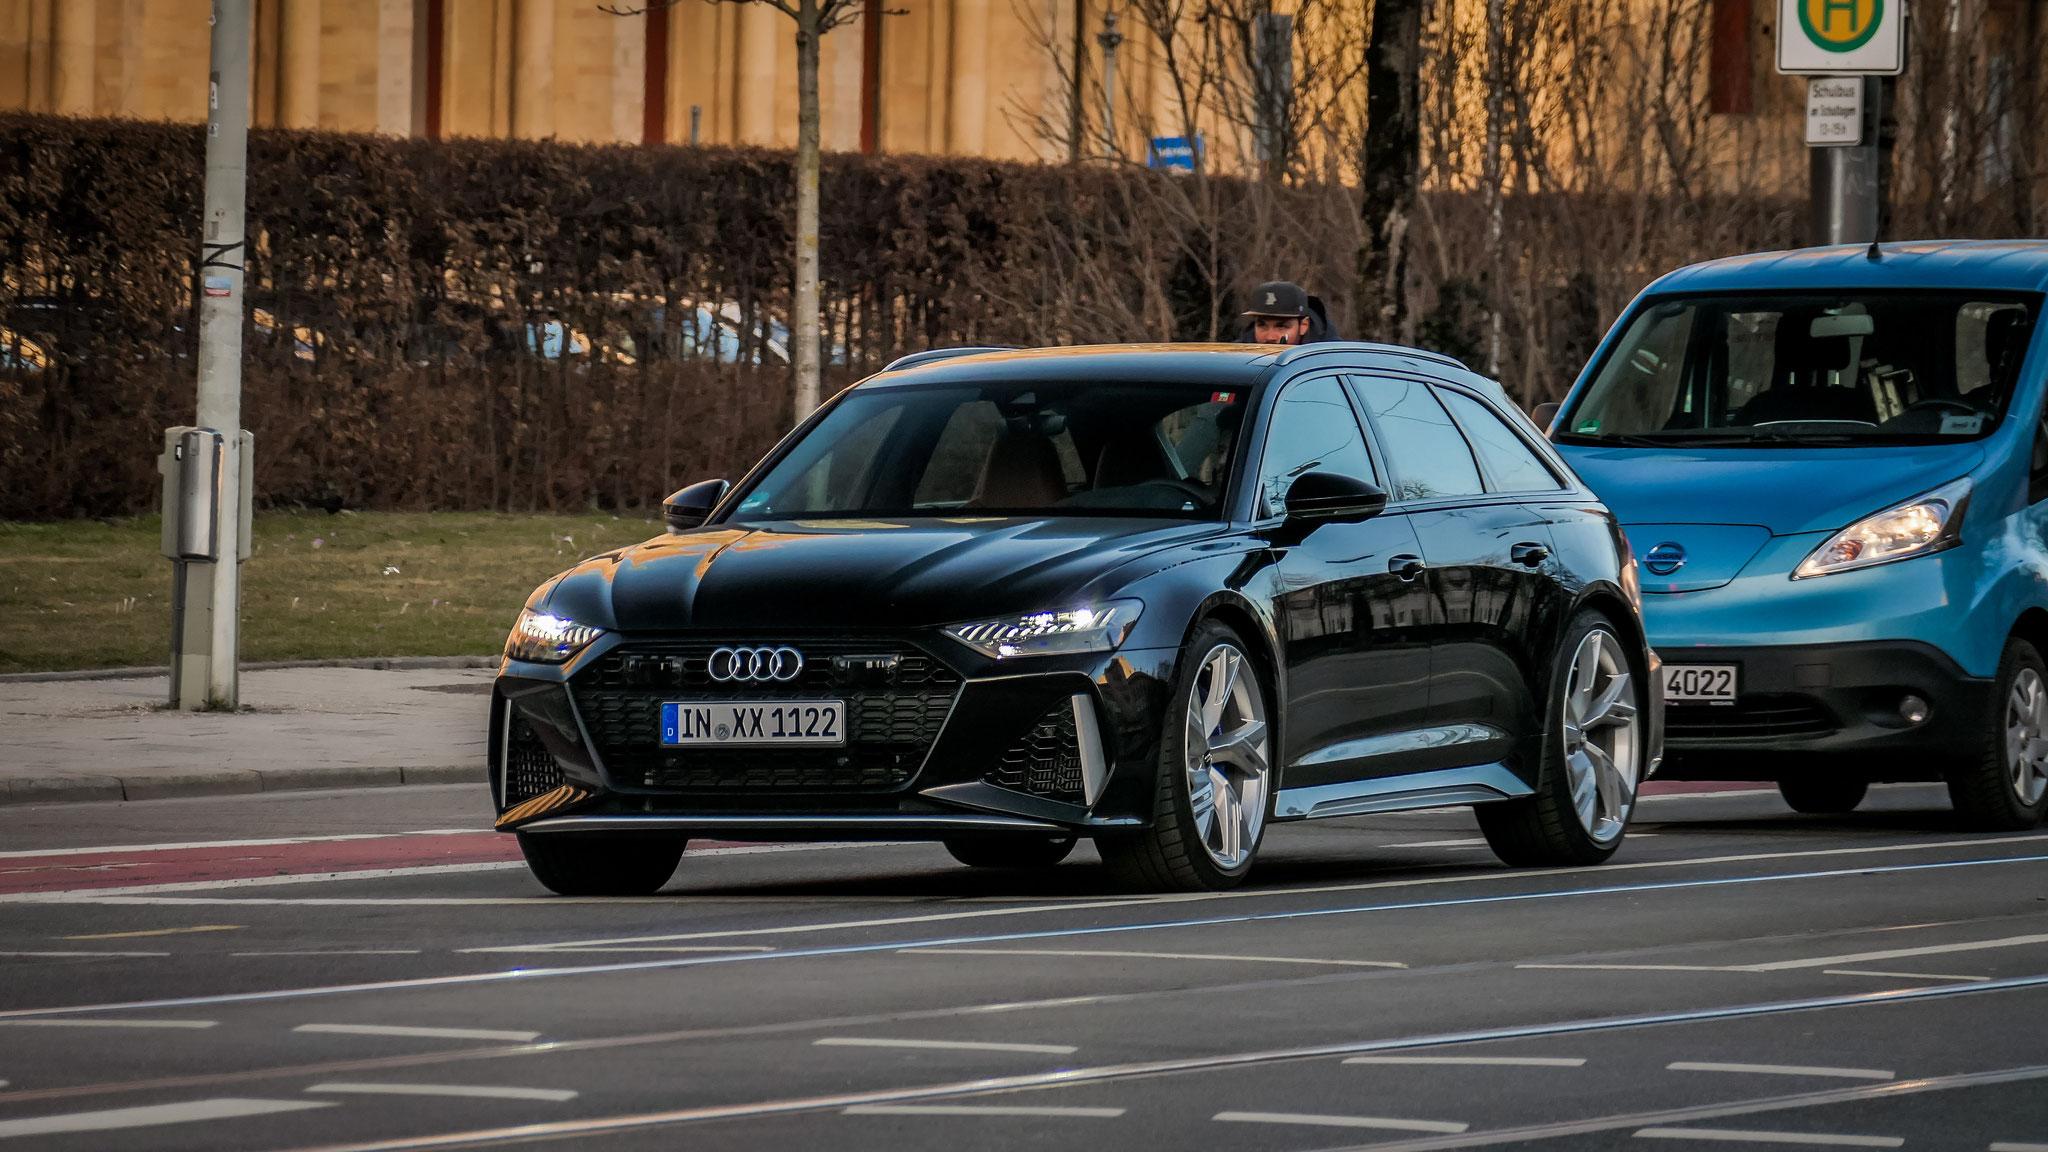 Audi RS6 - IN-XX-1122